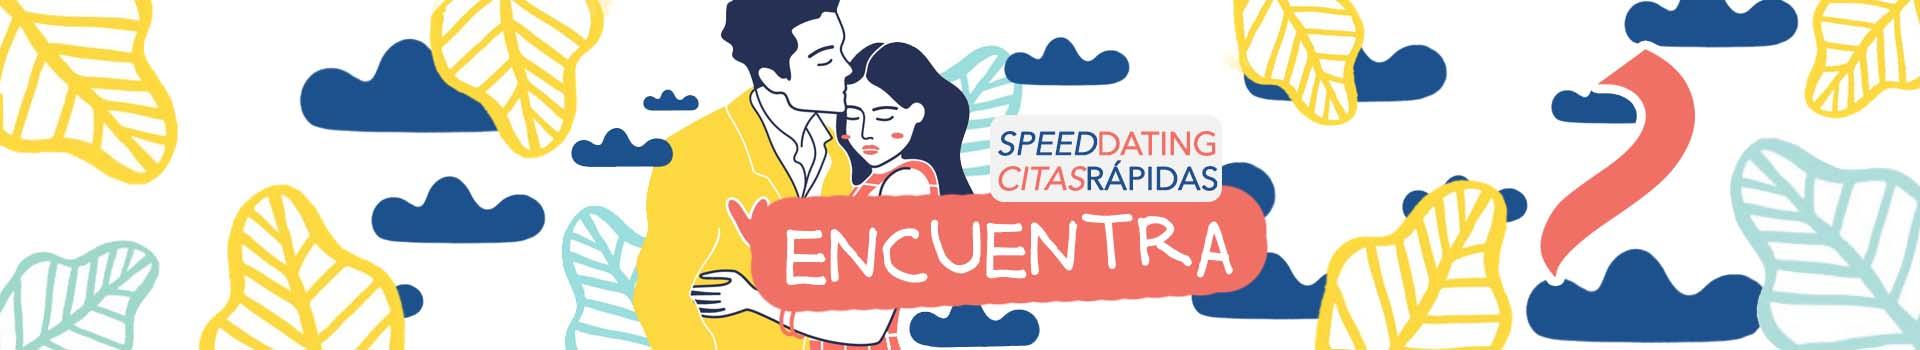 Speed dating traduzione italiano